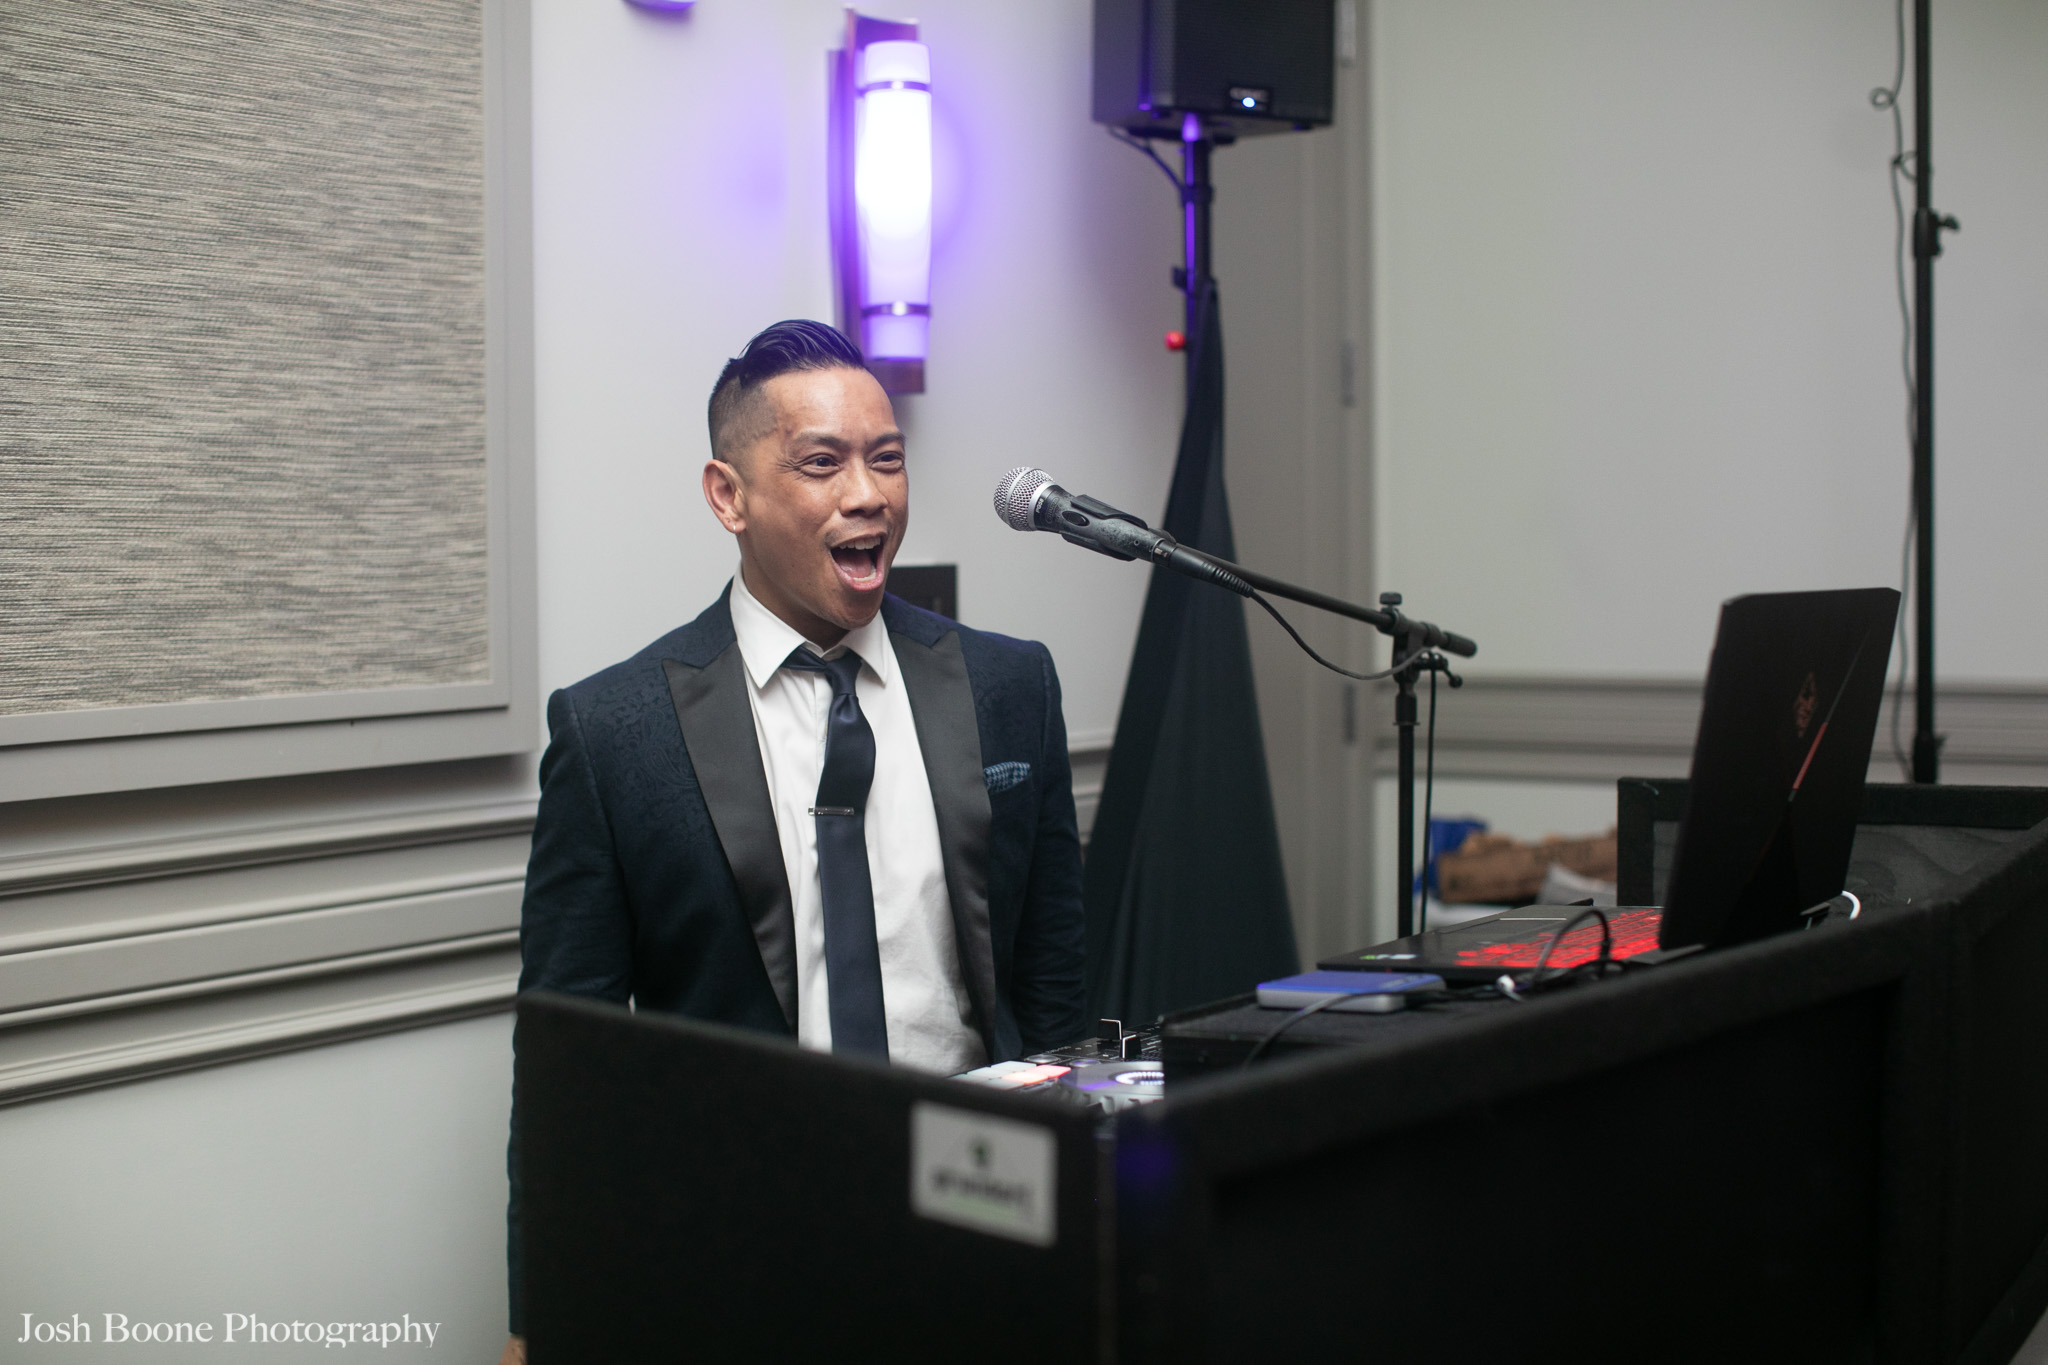 noahs_event_venue_wedding-101.jpg